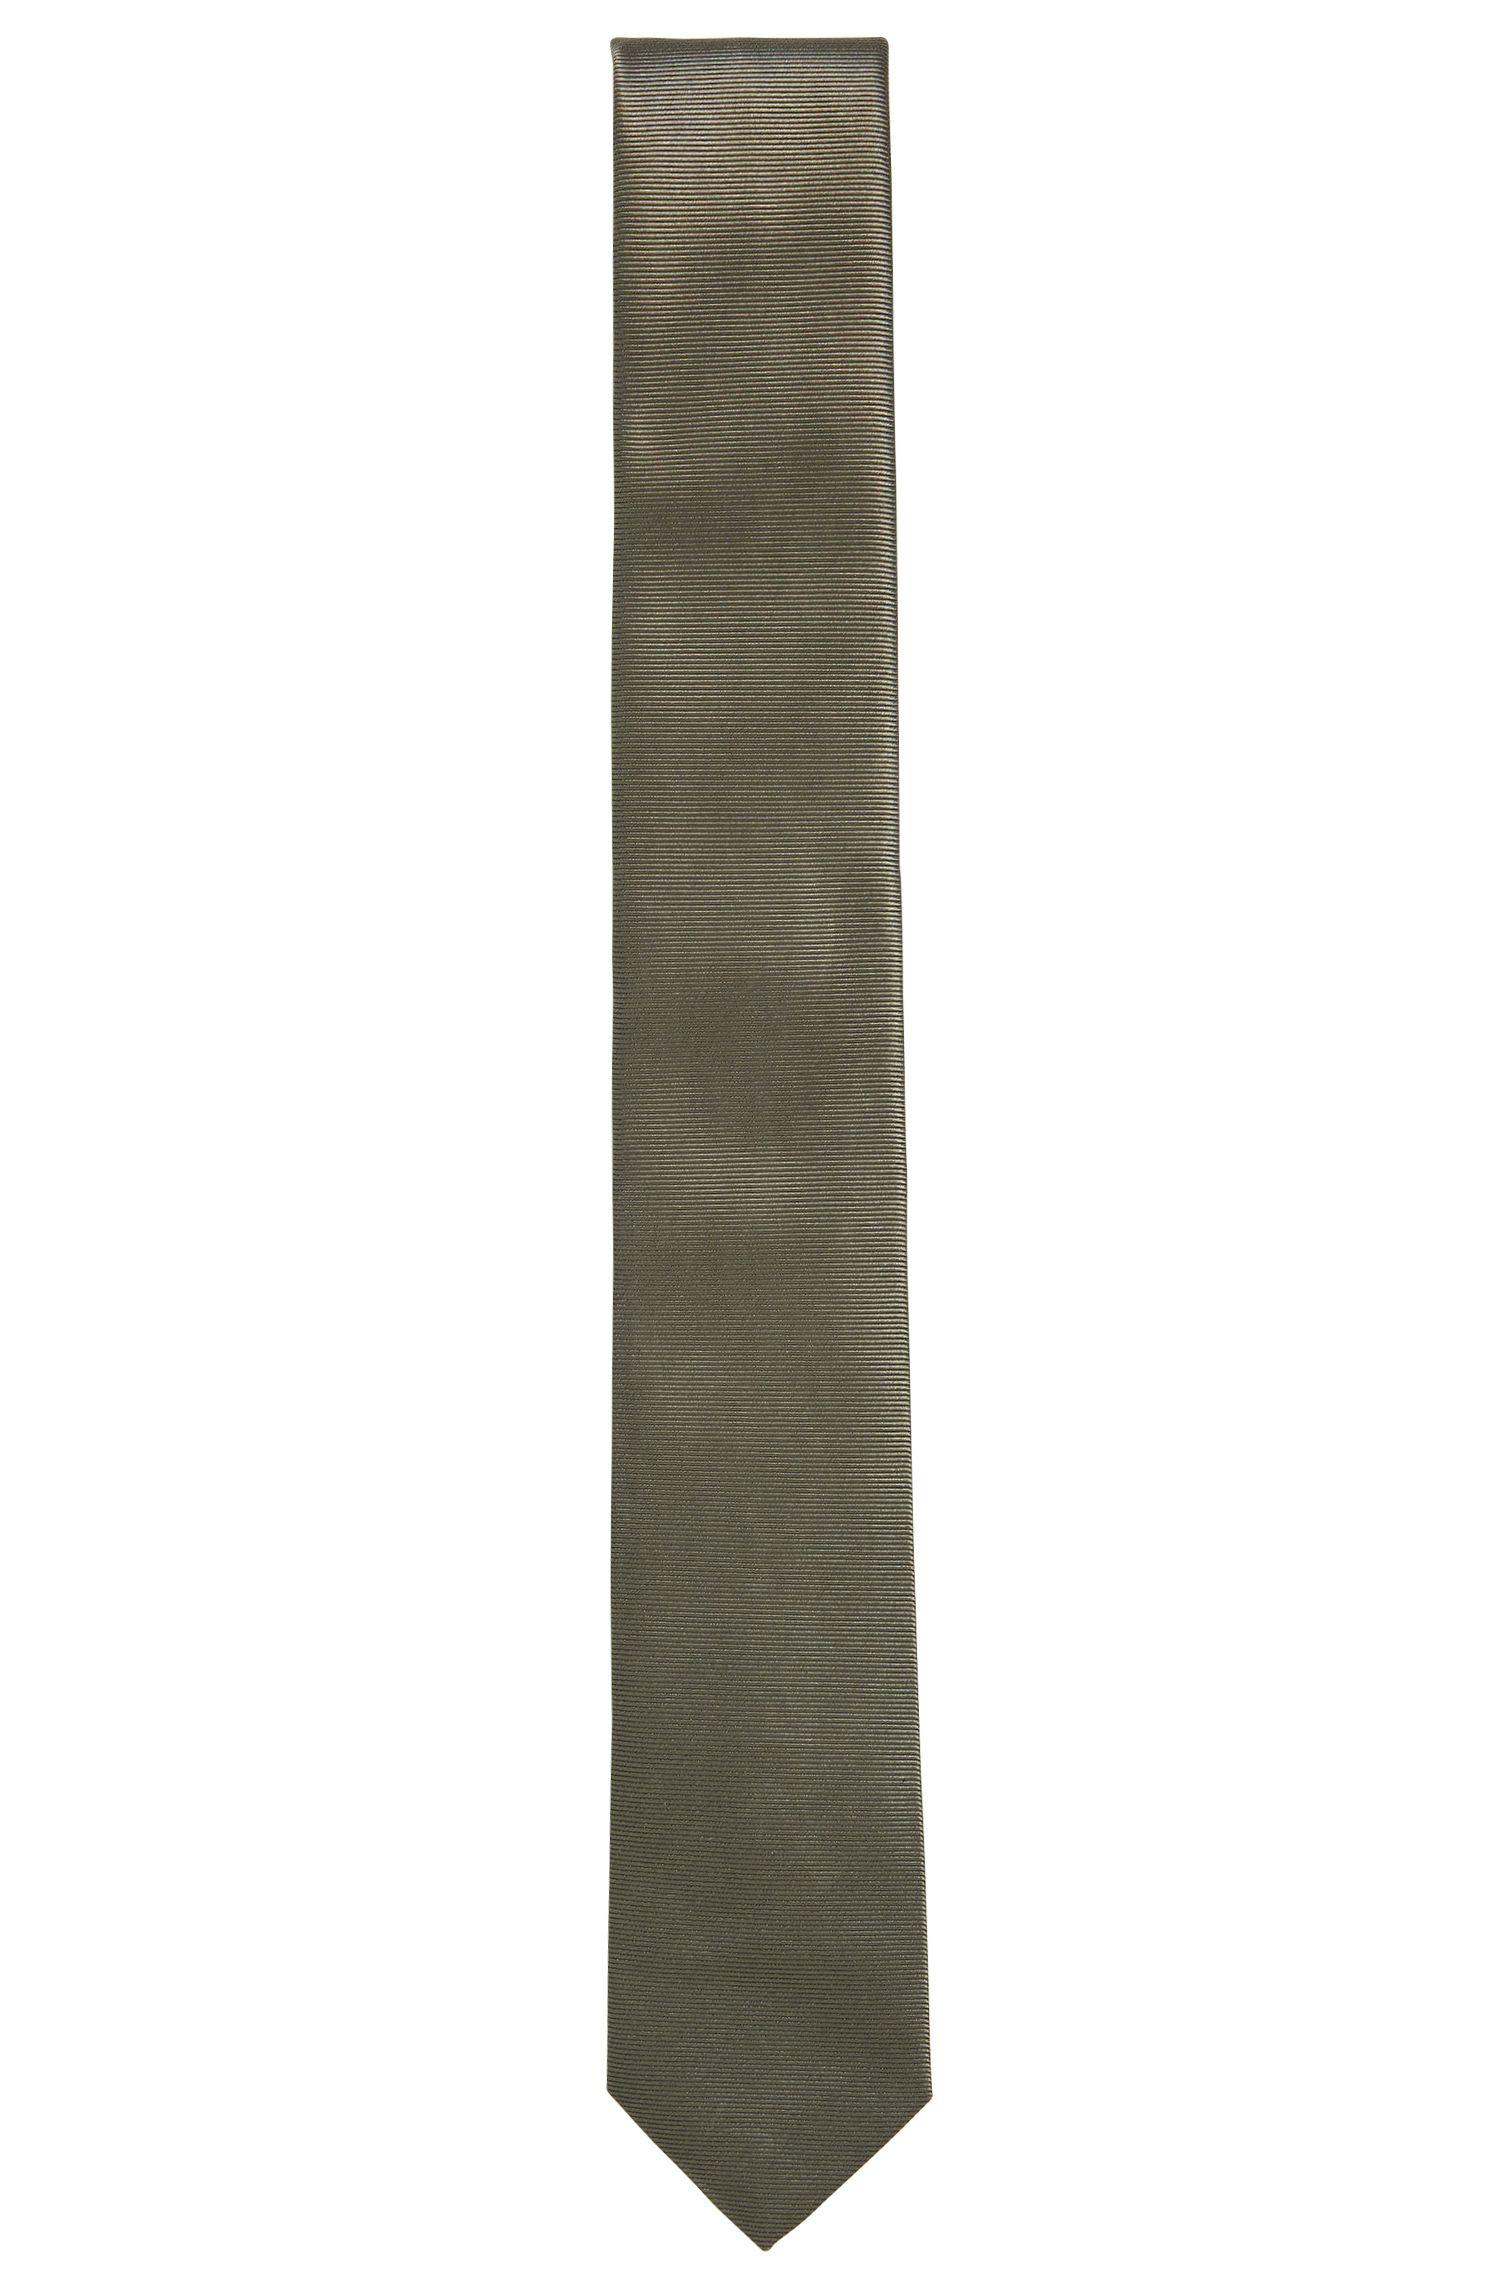 'T-Tie 6 cm' | Slim, Italian Silk Tie